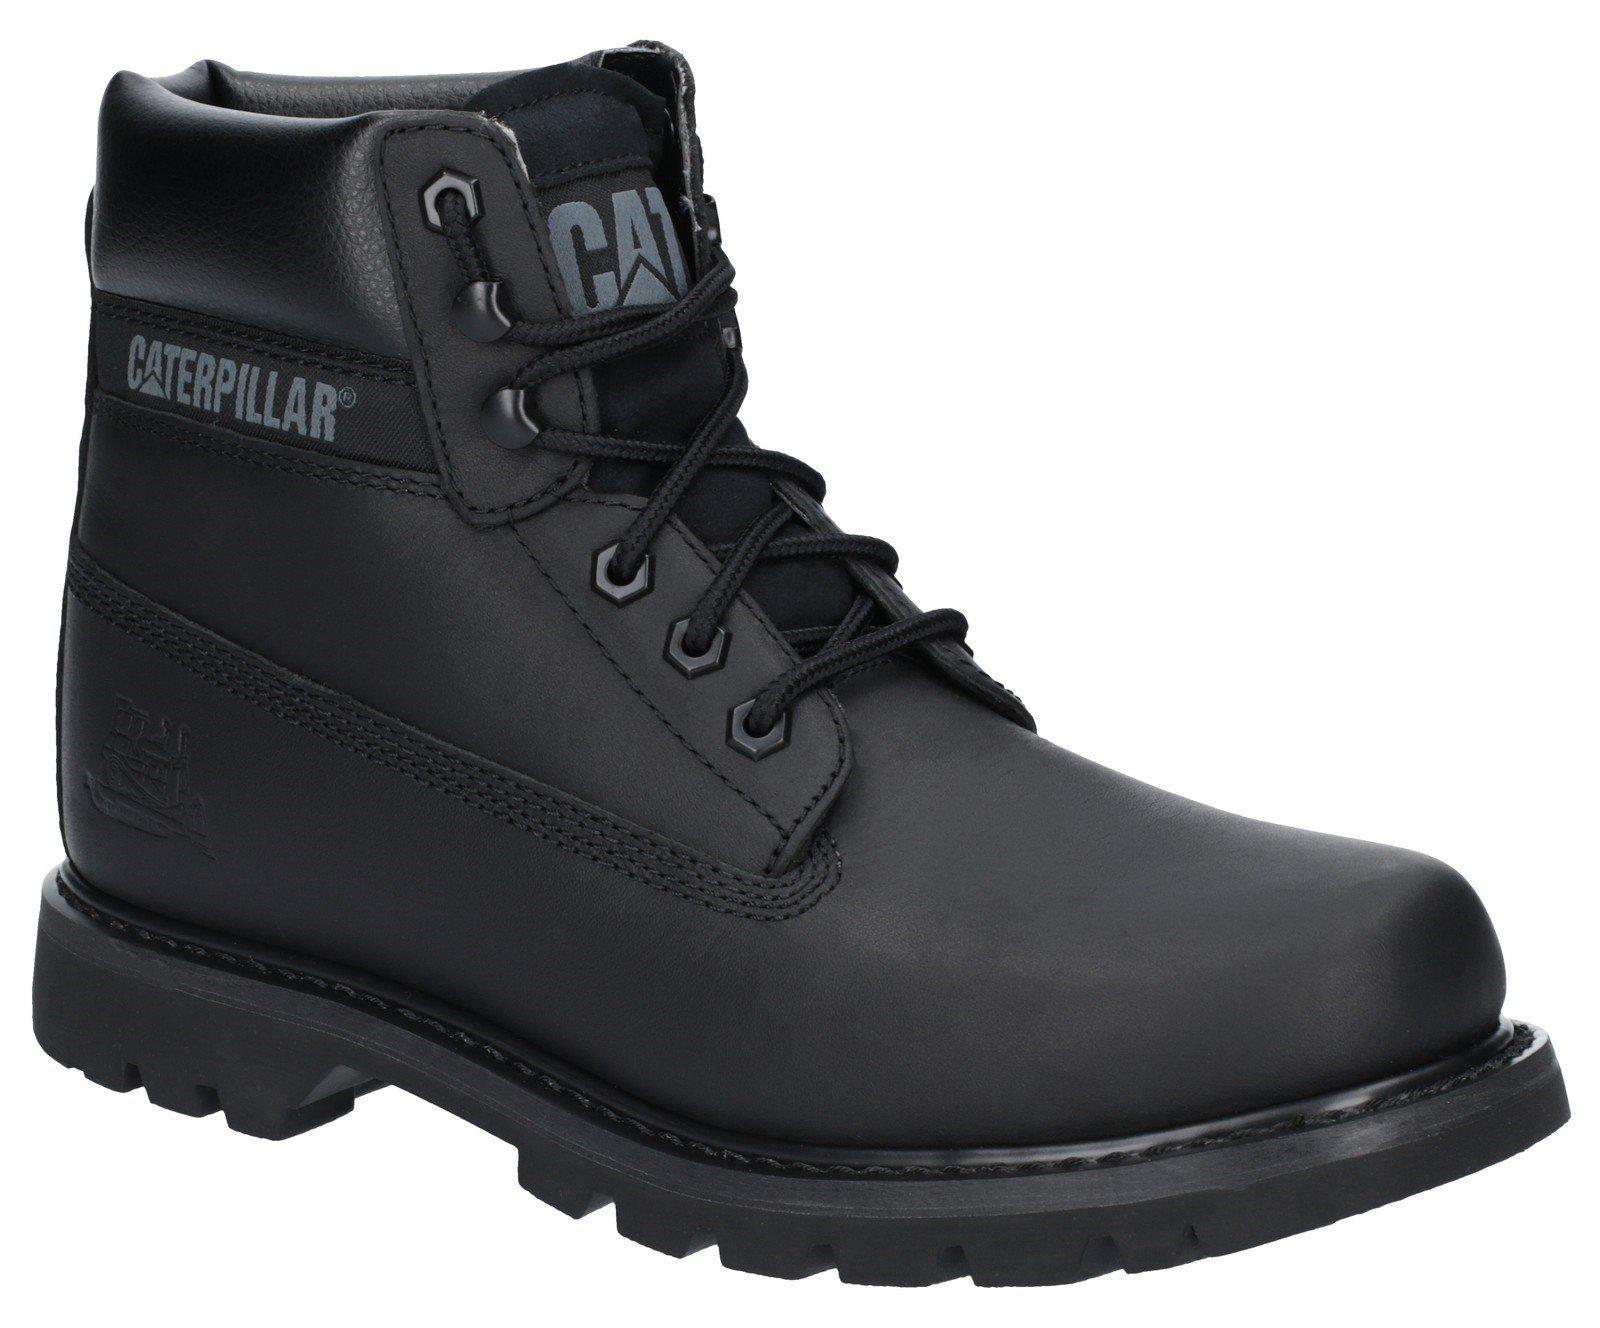 CAT Lifestyle Men's Colorado Boot Black 28721 - Black 7